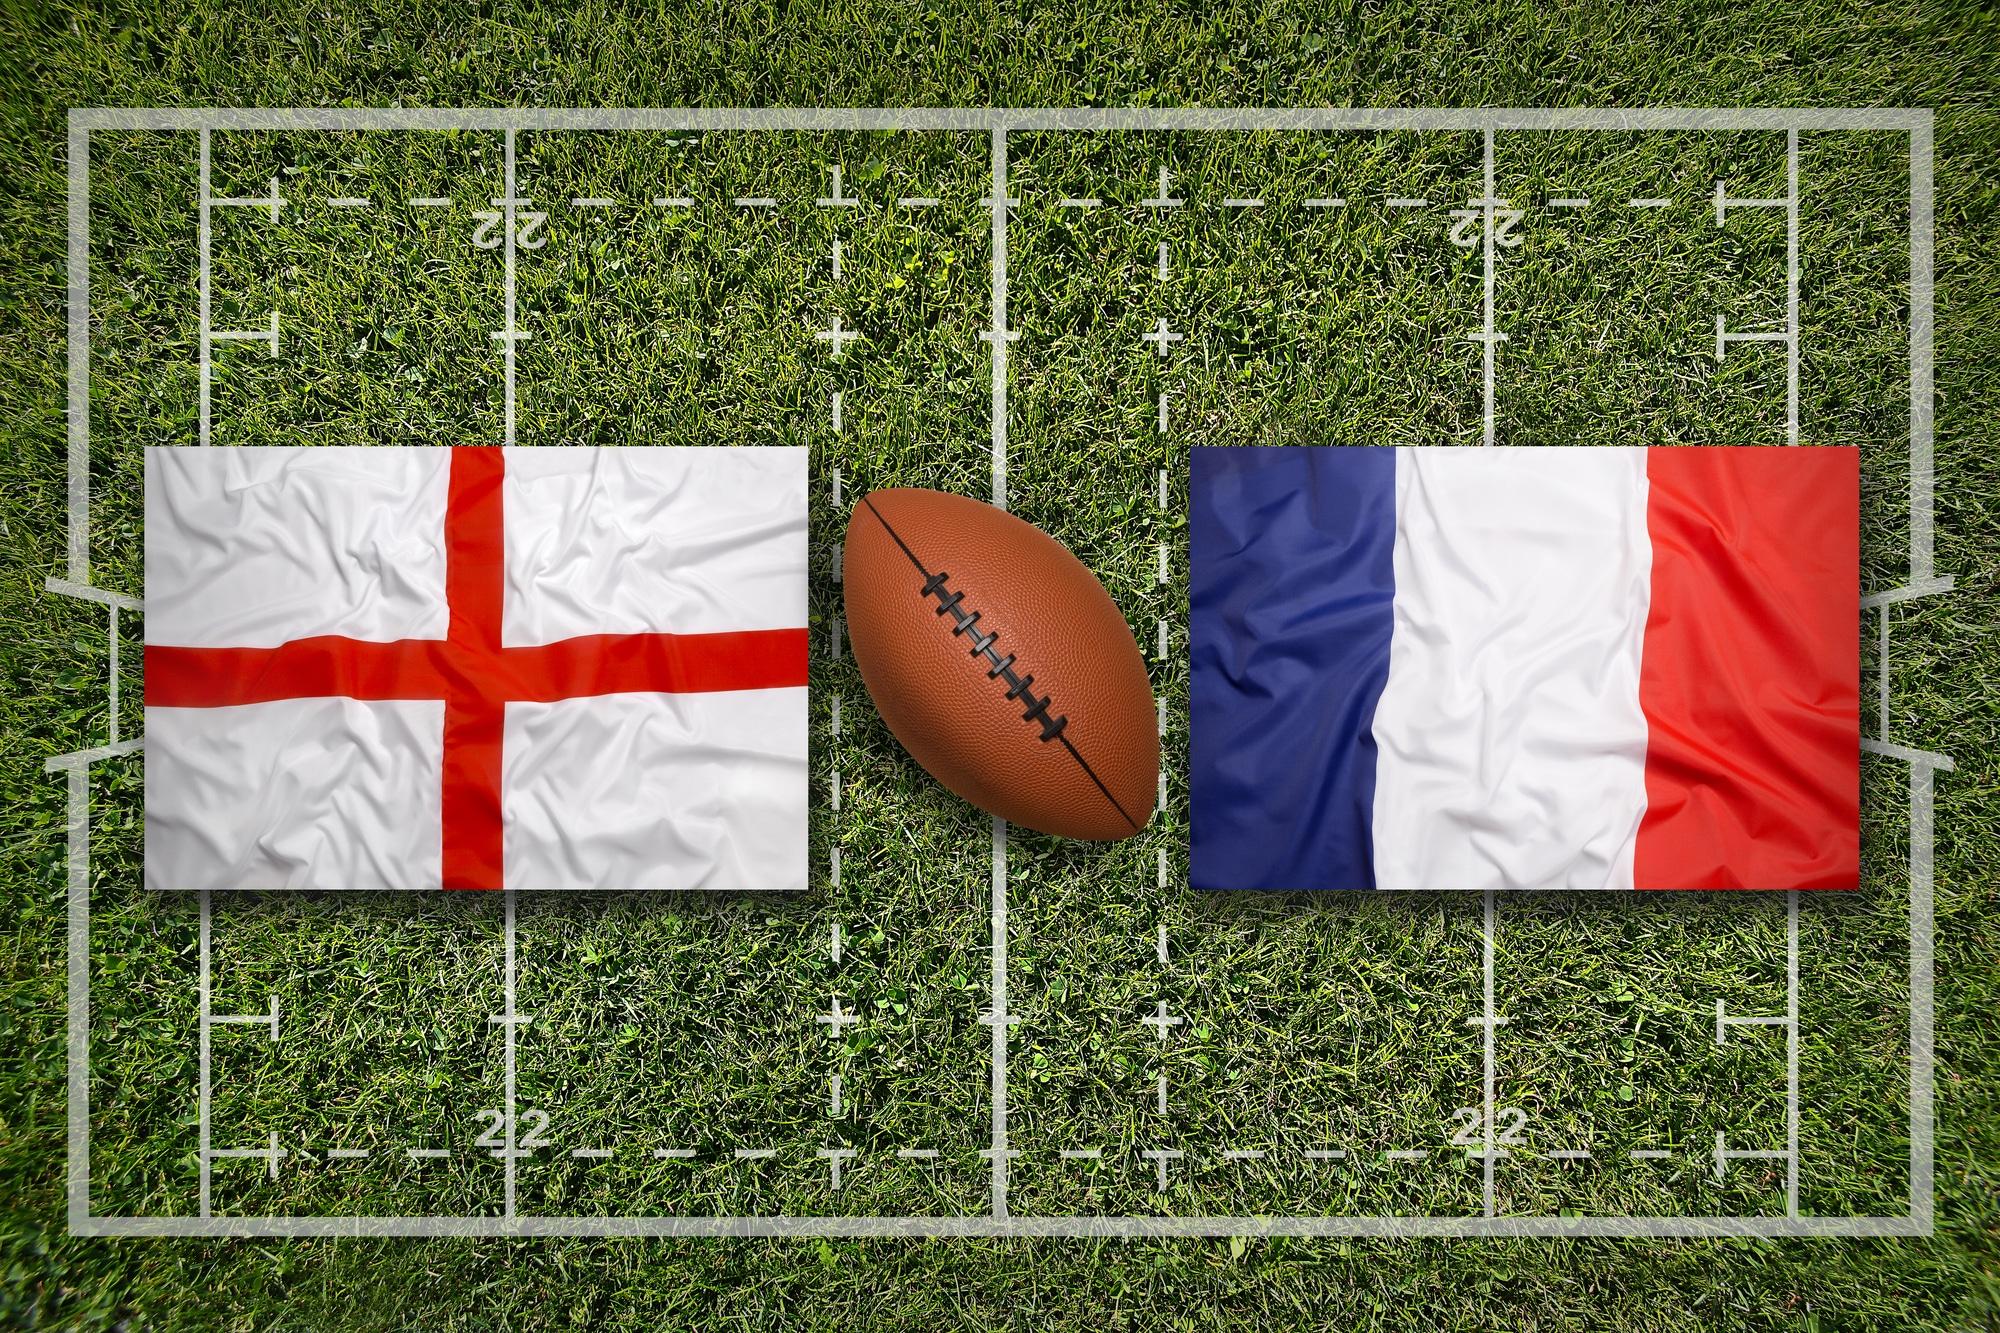 England v France Prediction & Preview 6 Nations